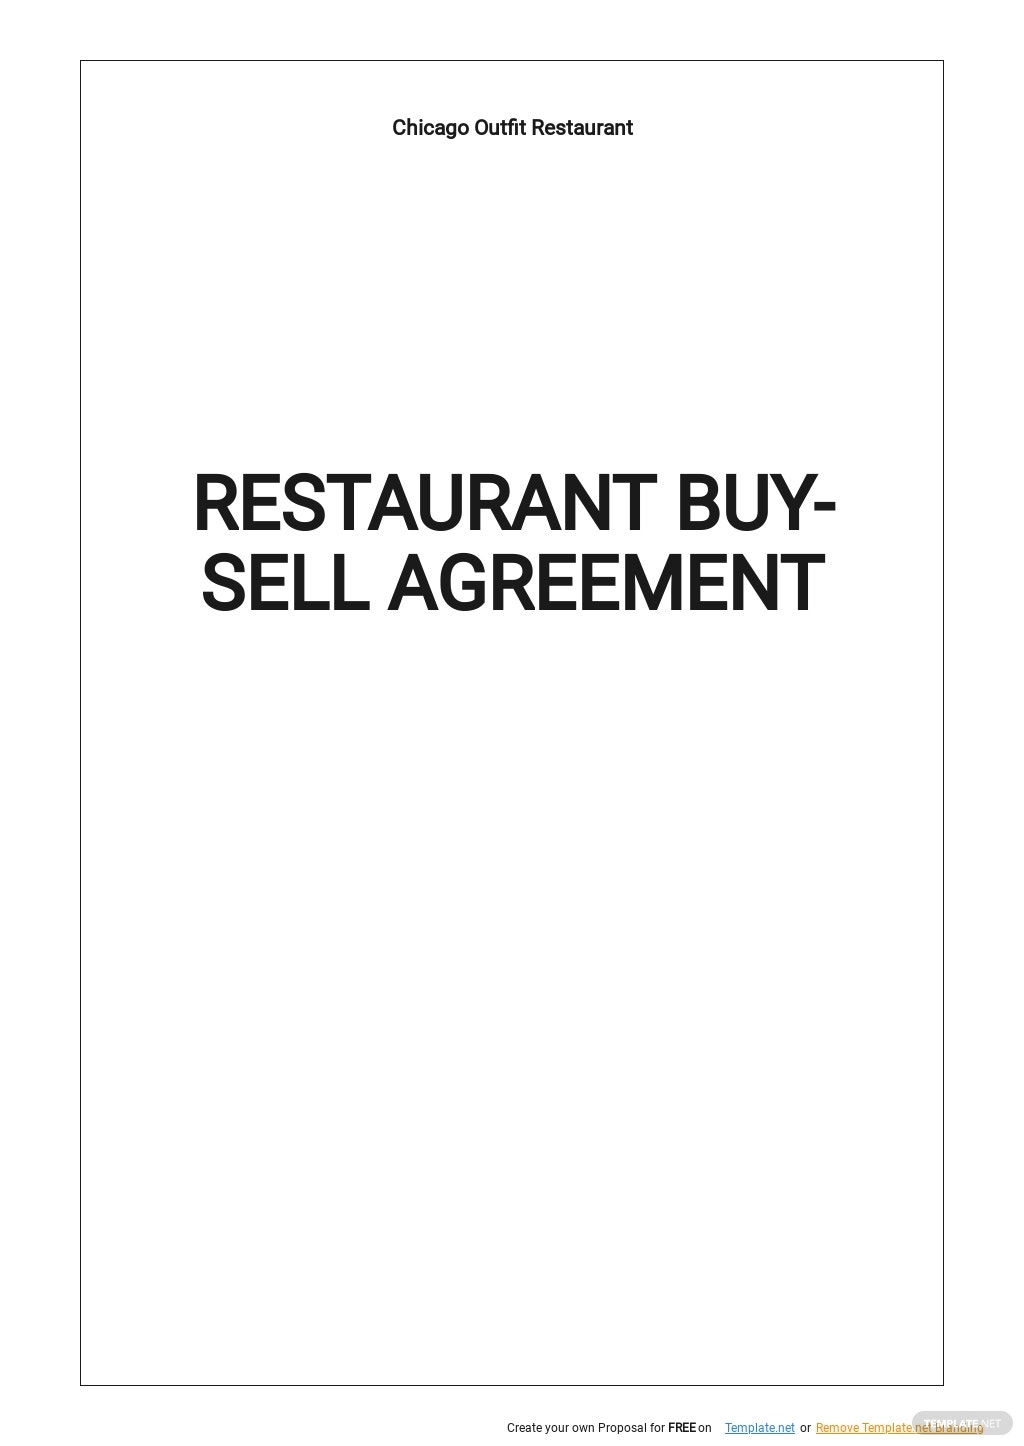 Restaurant Buy Sell Agreement Template.jpe